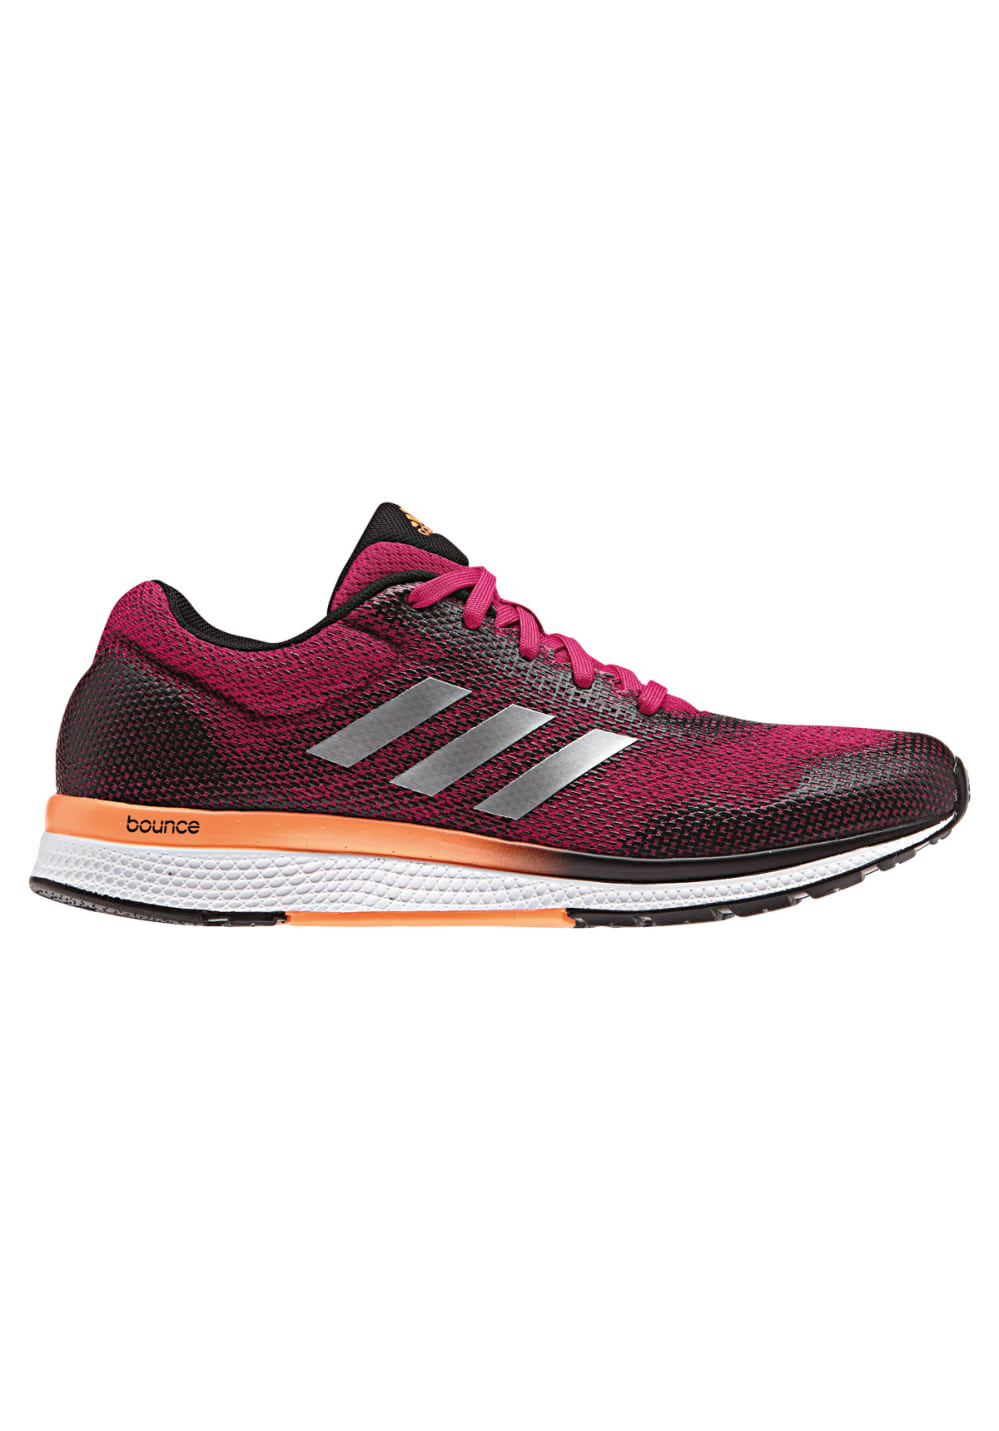 Aramis Violet 2 Femme Mana Running Chaussures Pour Adidas Bounce uF3Tc5lK1J